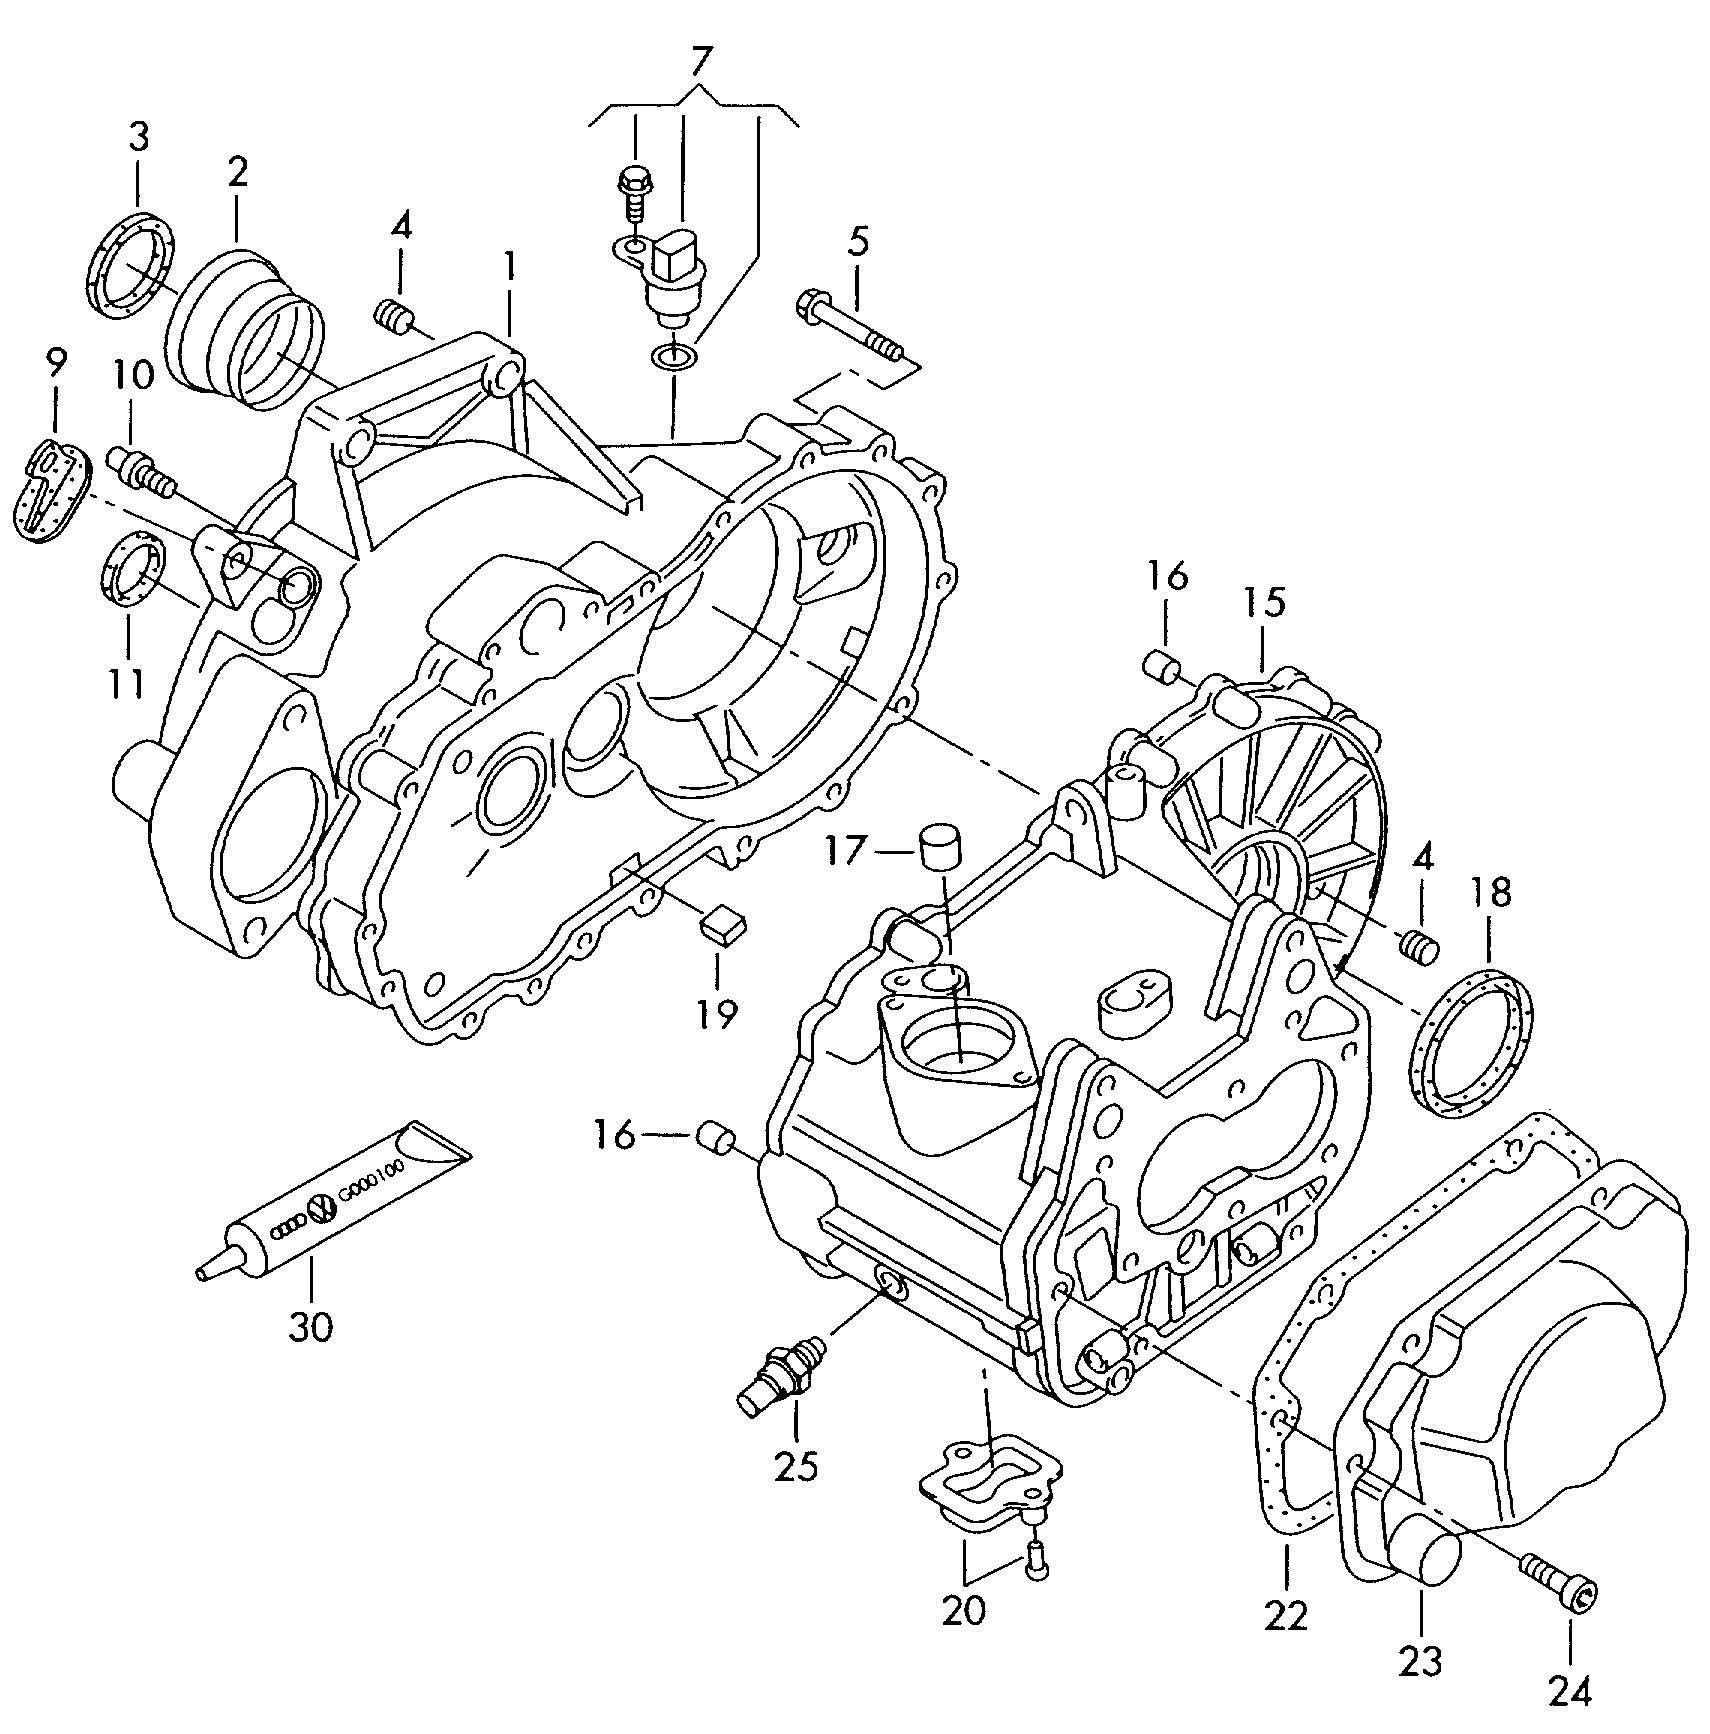 Transmission Case For 5 Speed Manual Transmiss